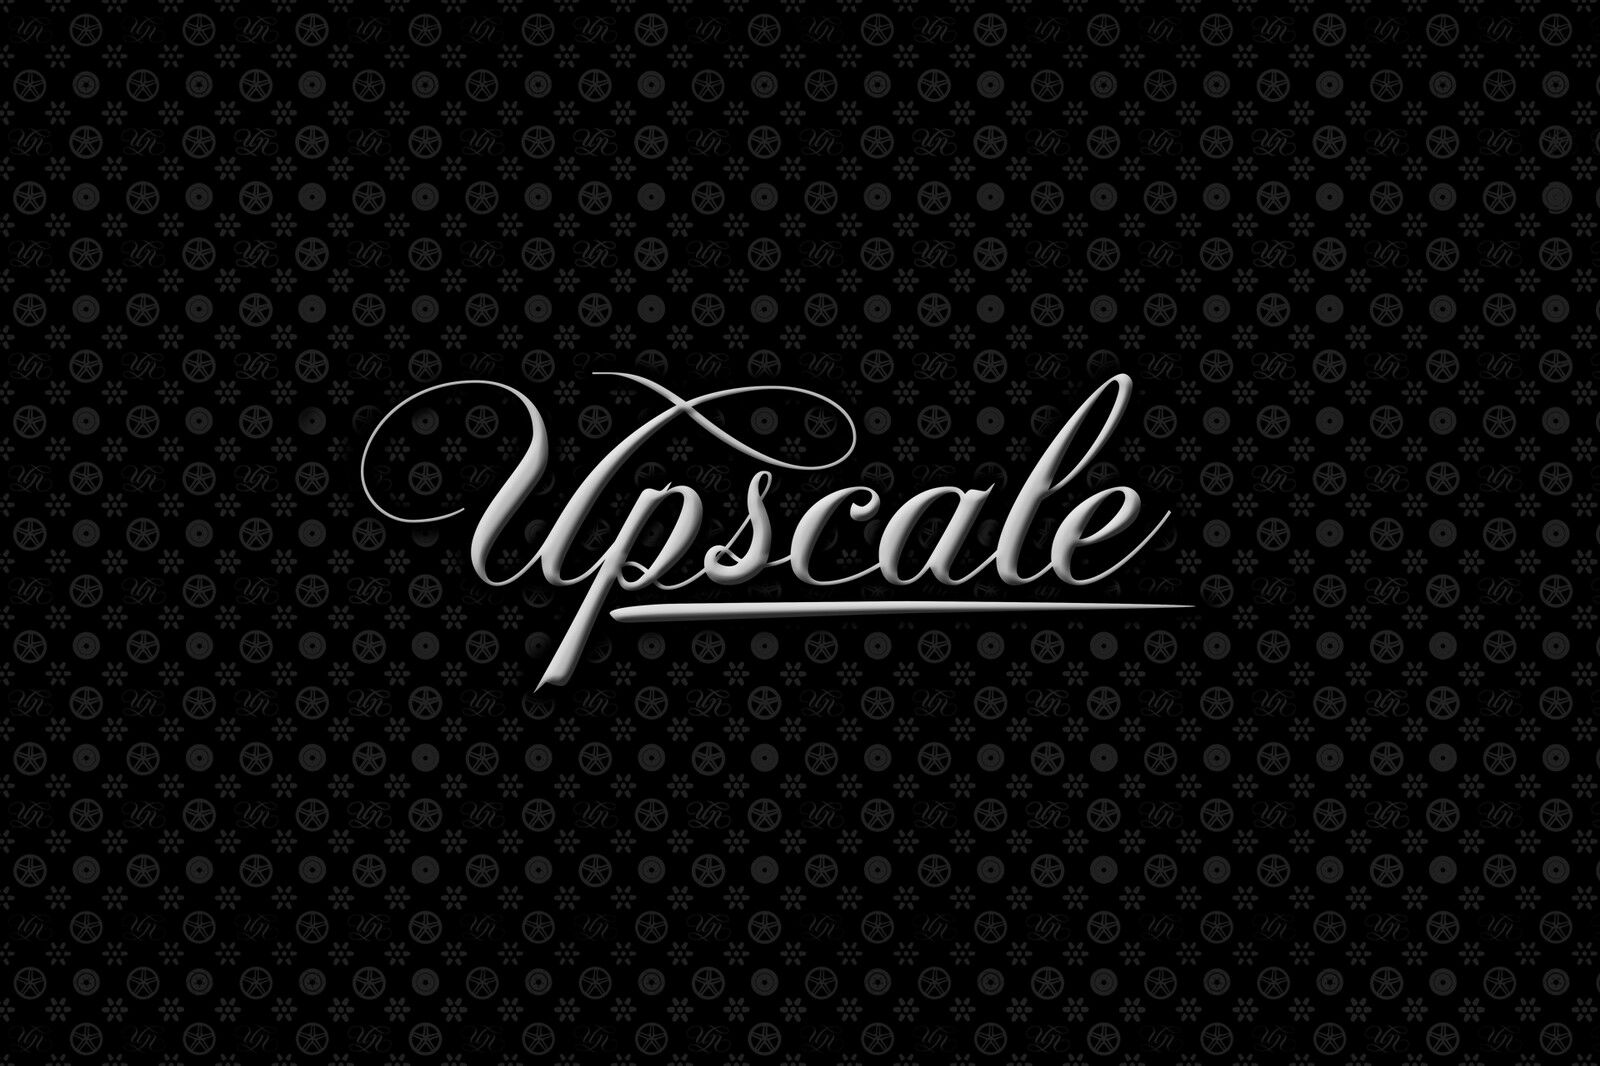 Texas-Upscale-Treasures